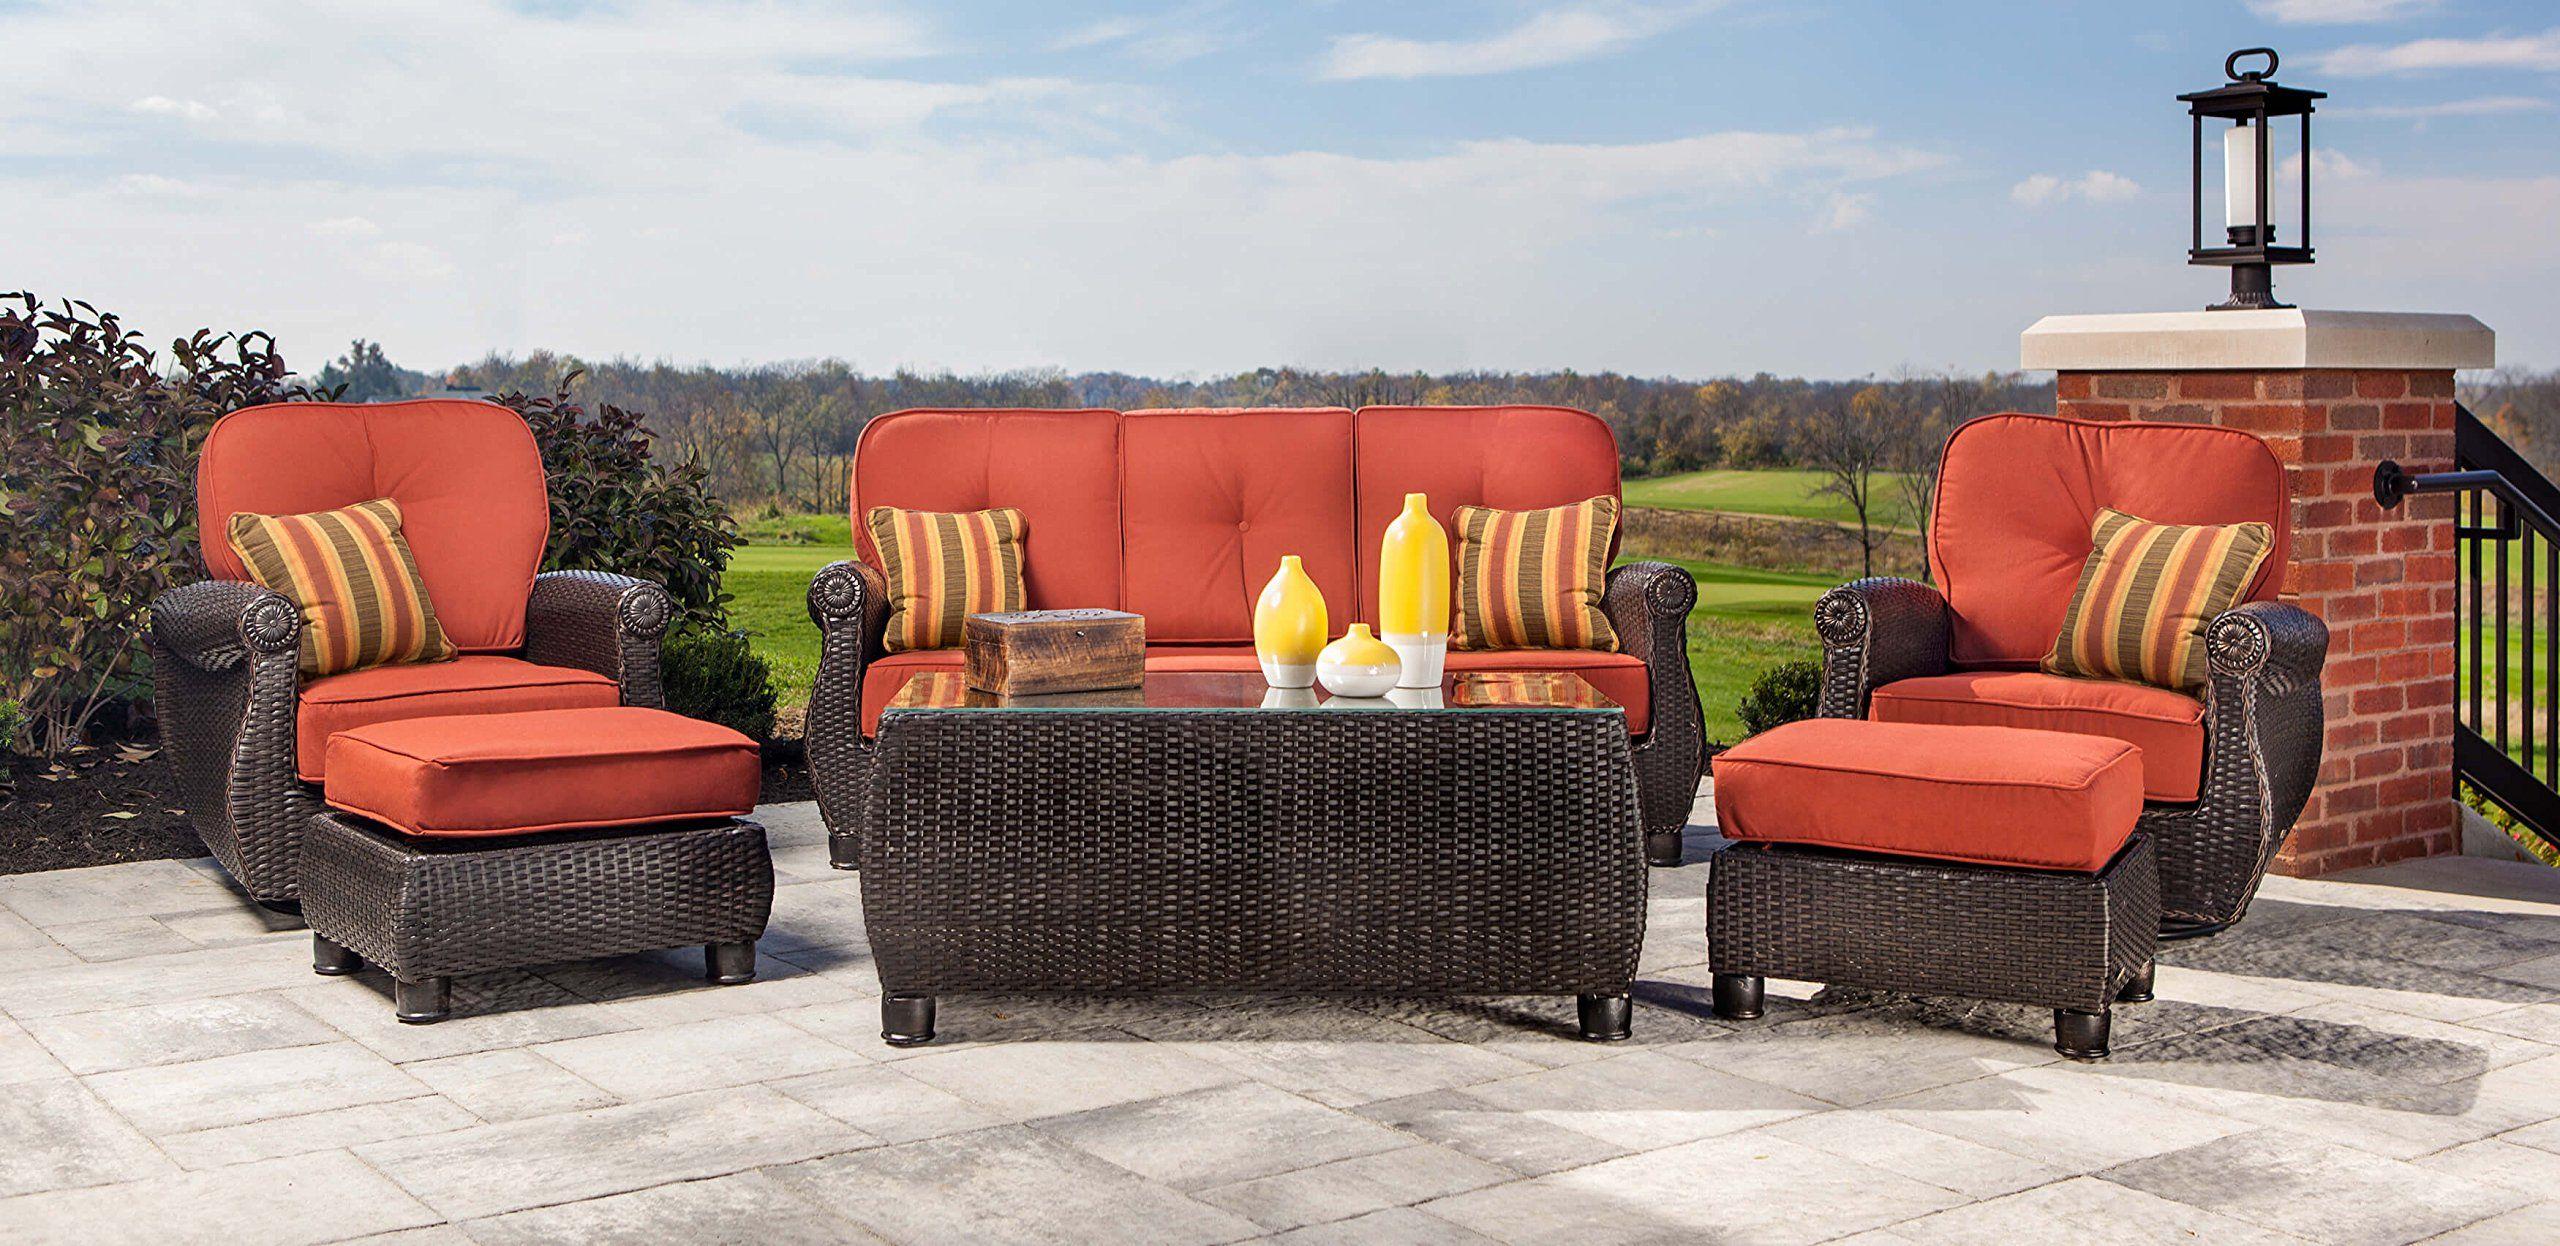 Lazboy Outdoor Breckenridge Resin Wicker Patio Furniture Ottomans 2 Piece Set Brick Red With A Resin Wicker Patio Furniture Patio Furniture Sets Patio Loveseat